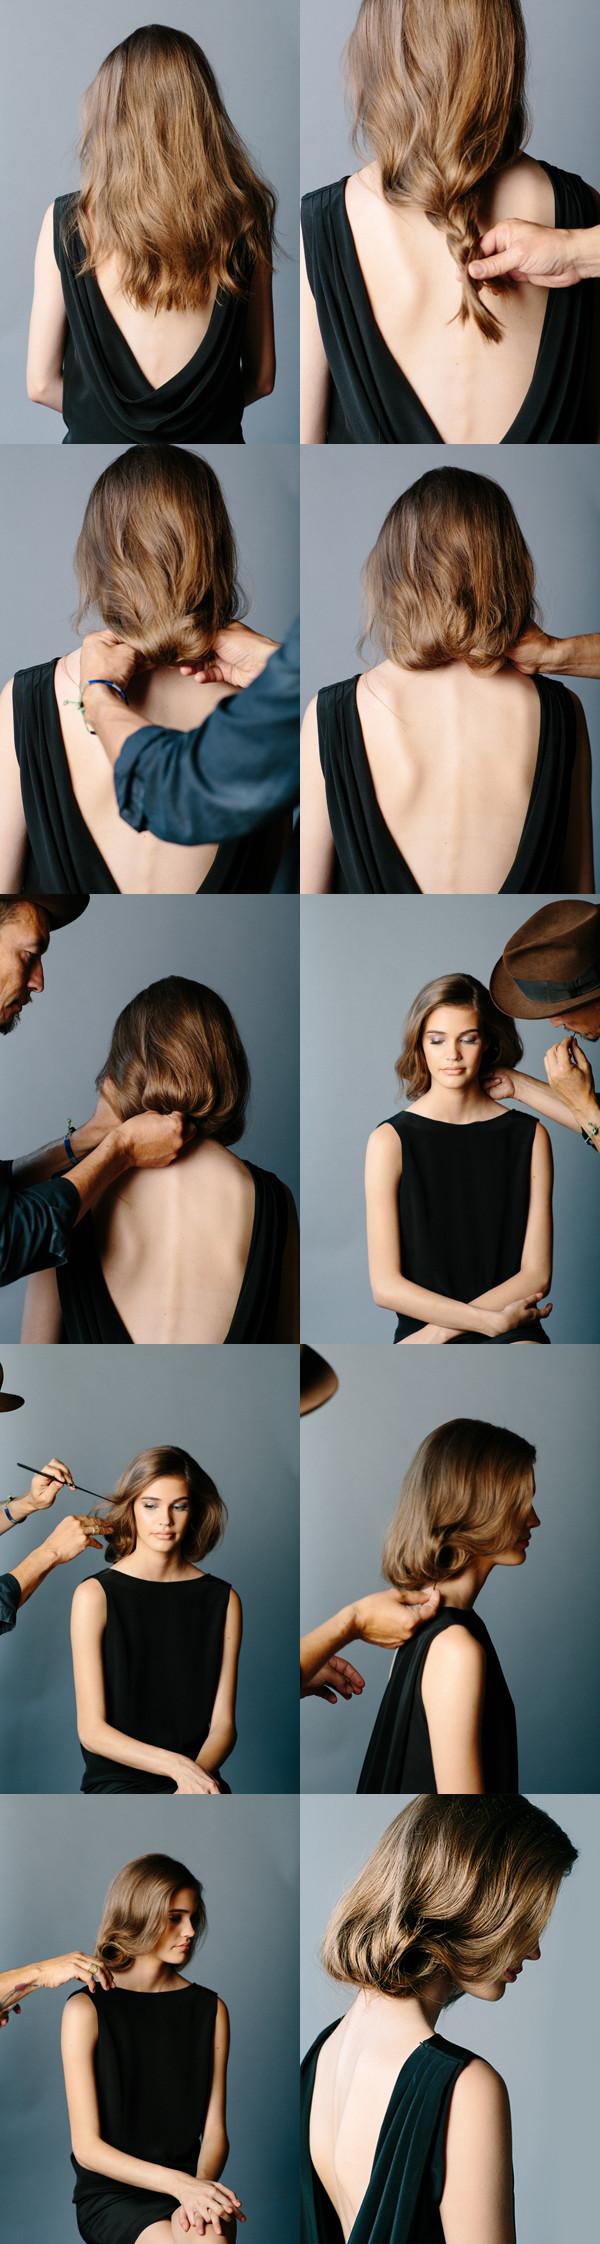 Best ideas about DIY Bob Haircut . Save or Pin DIY Faux Bob Wedding Hairstyle DIY Weddings Now.